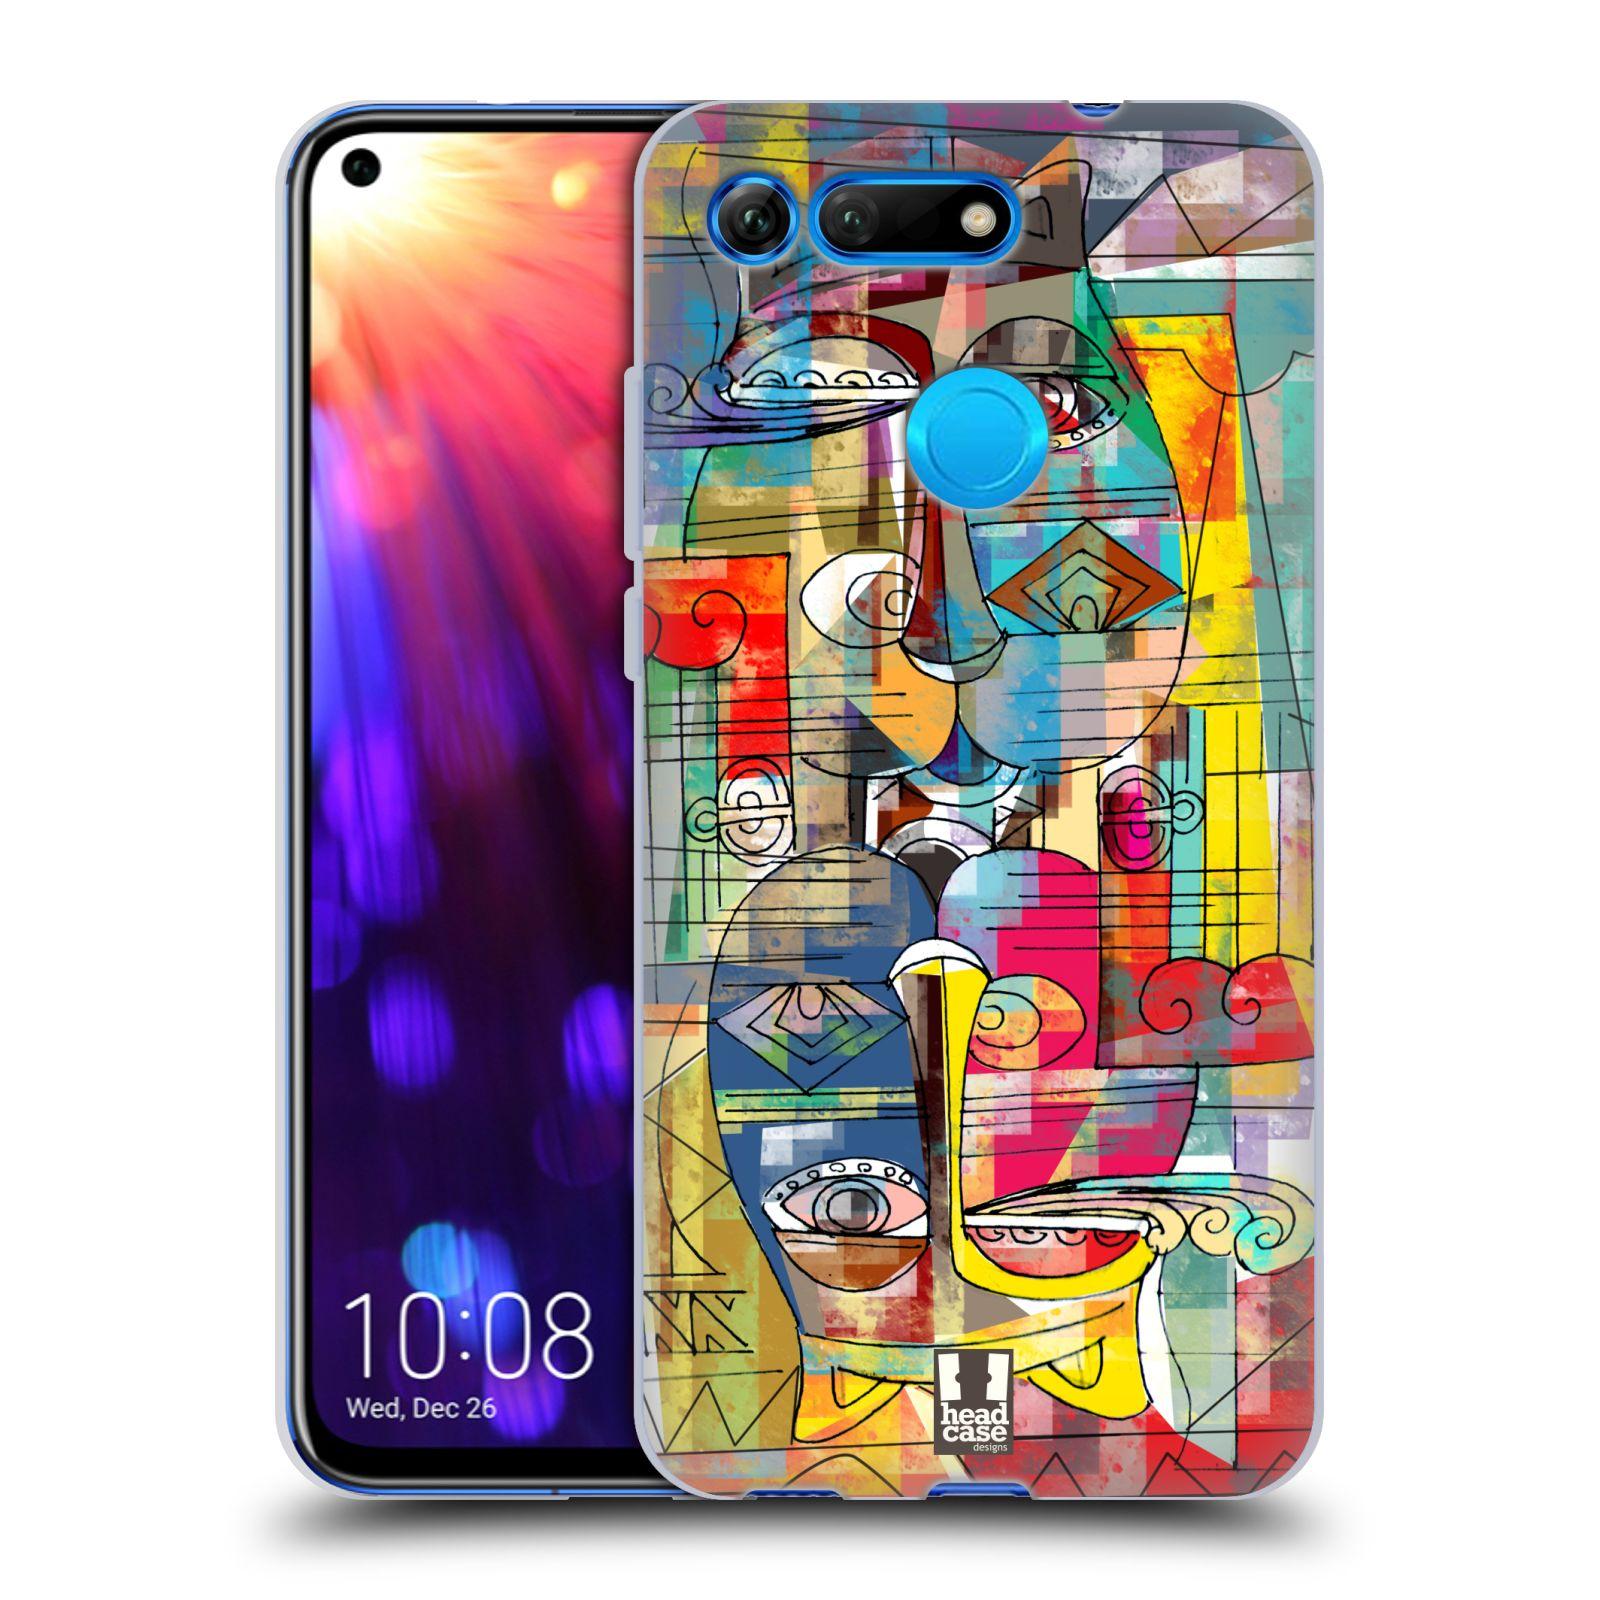 Silikonové pouzdro na mobil Honor View 20 - Head Case - AZTEC MANX